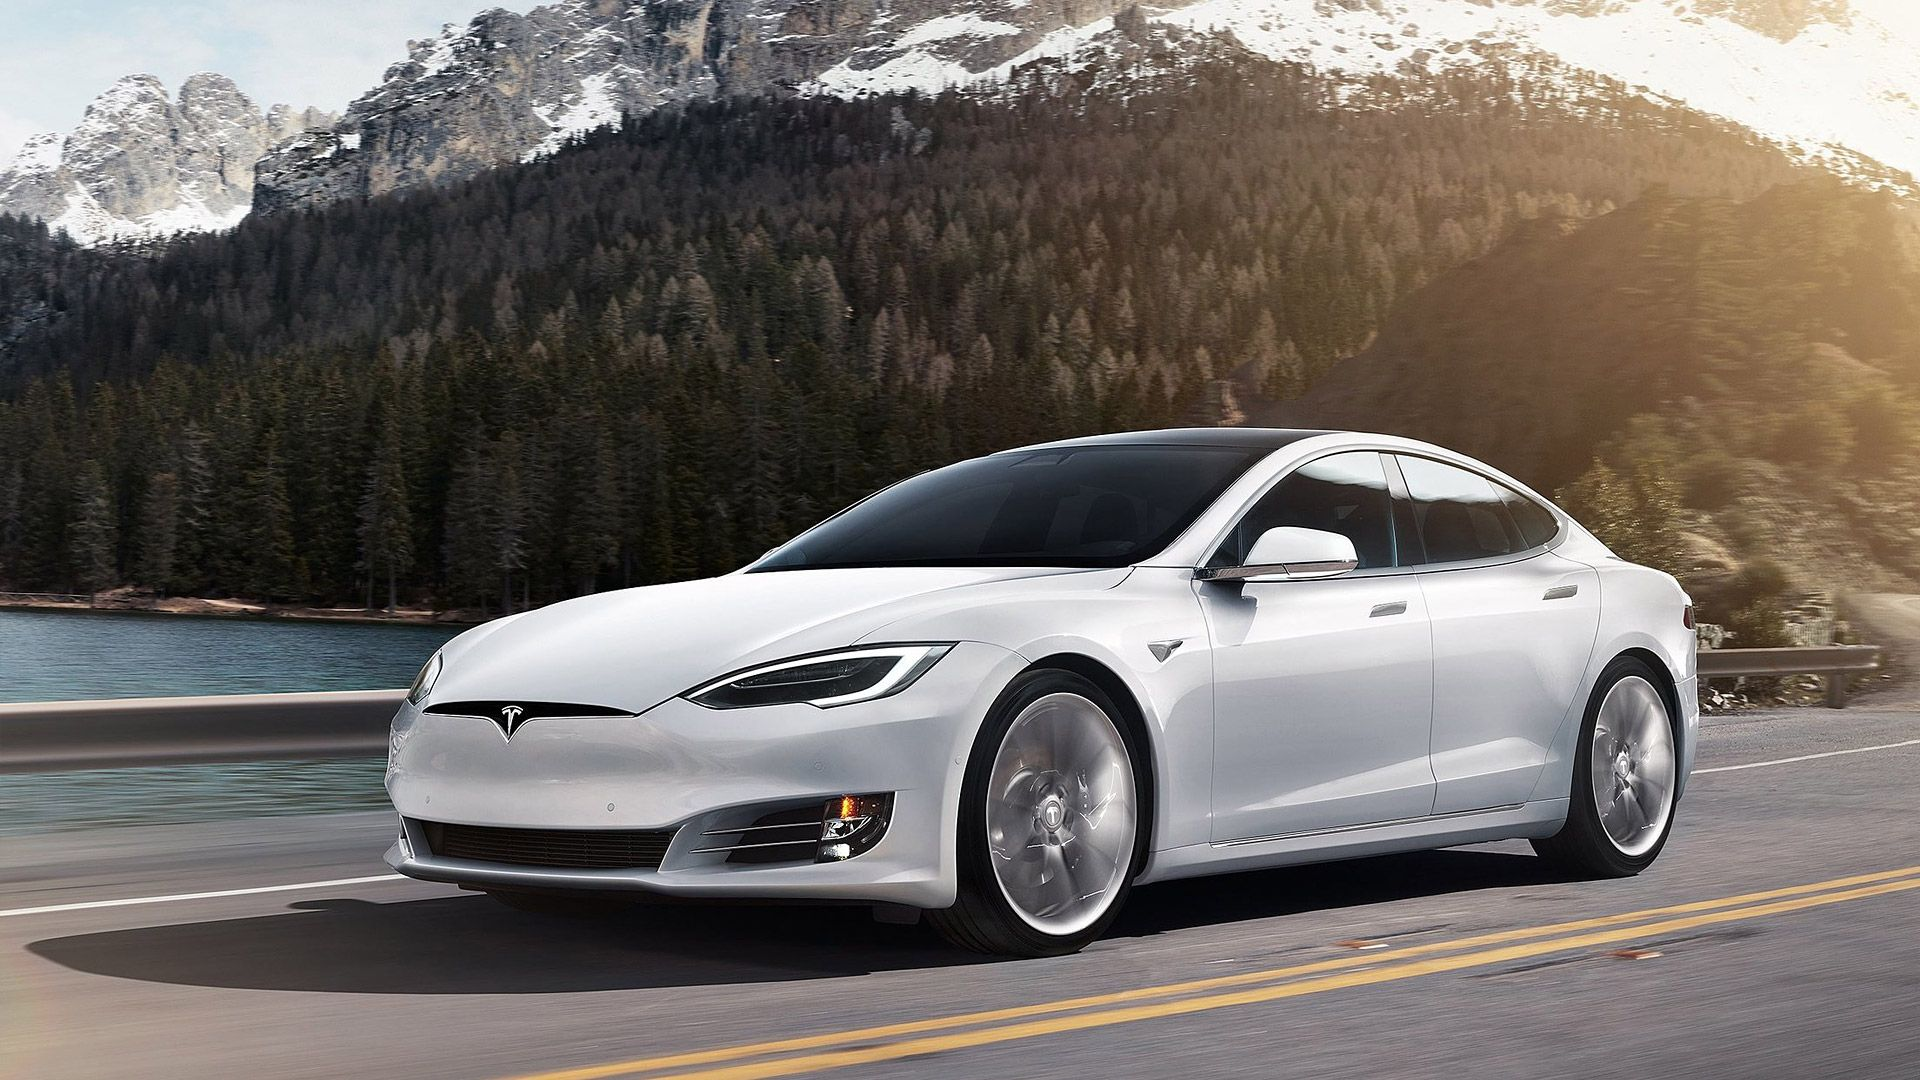 Cool Tesla Wallpapers Top Free Cool Tesla Backgrounds